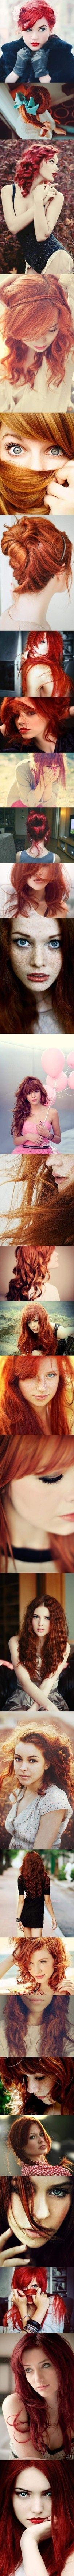 best hair n make up images on pinterest hair dos make up looks